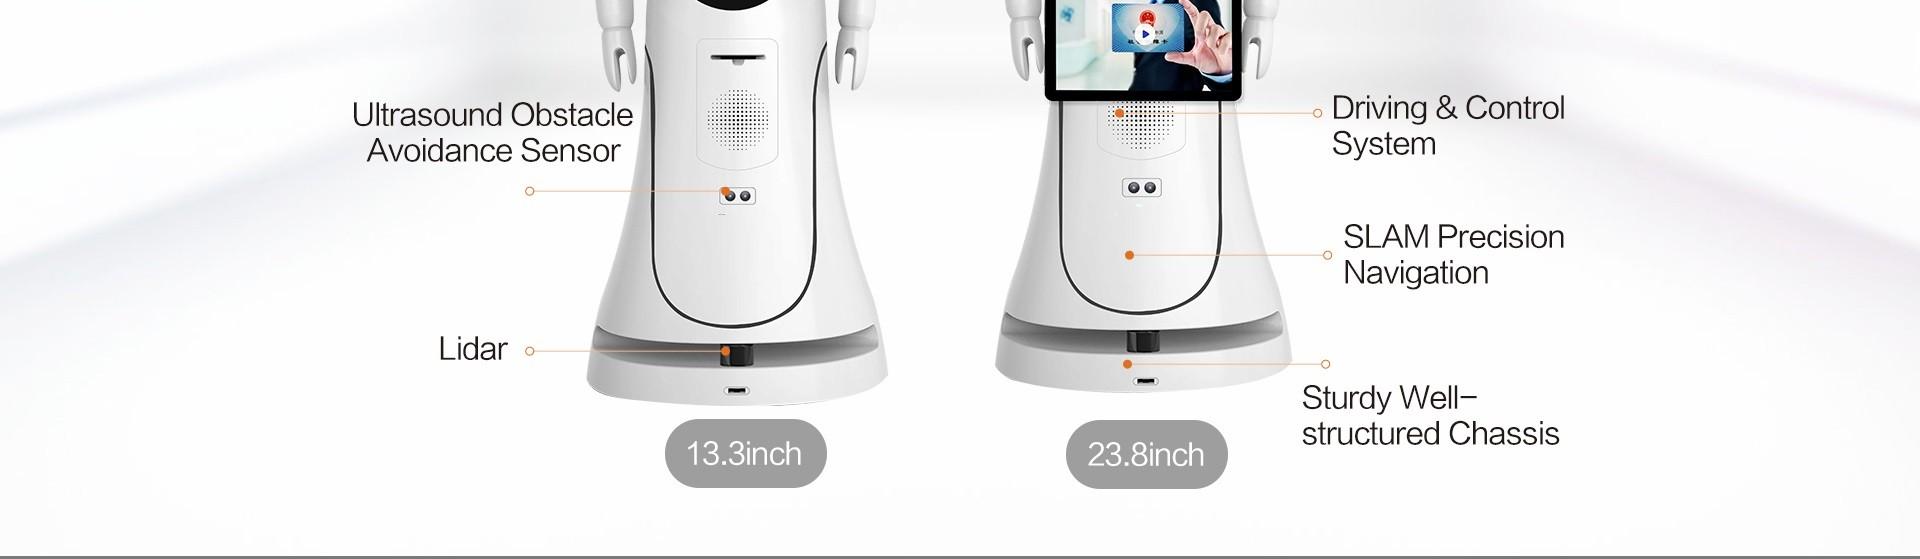 Intelligent Humanoid Reception Telepresence Robot SIFROBOT-5.0  robot